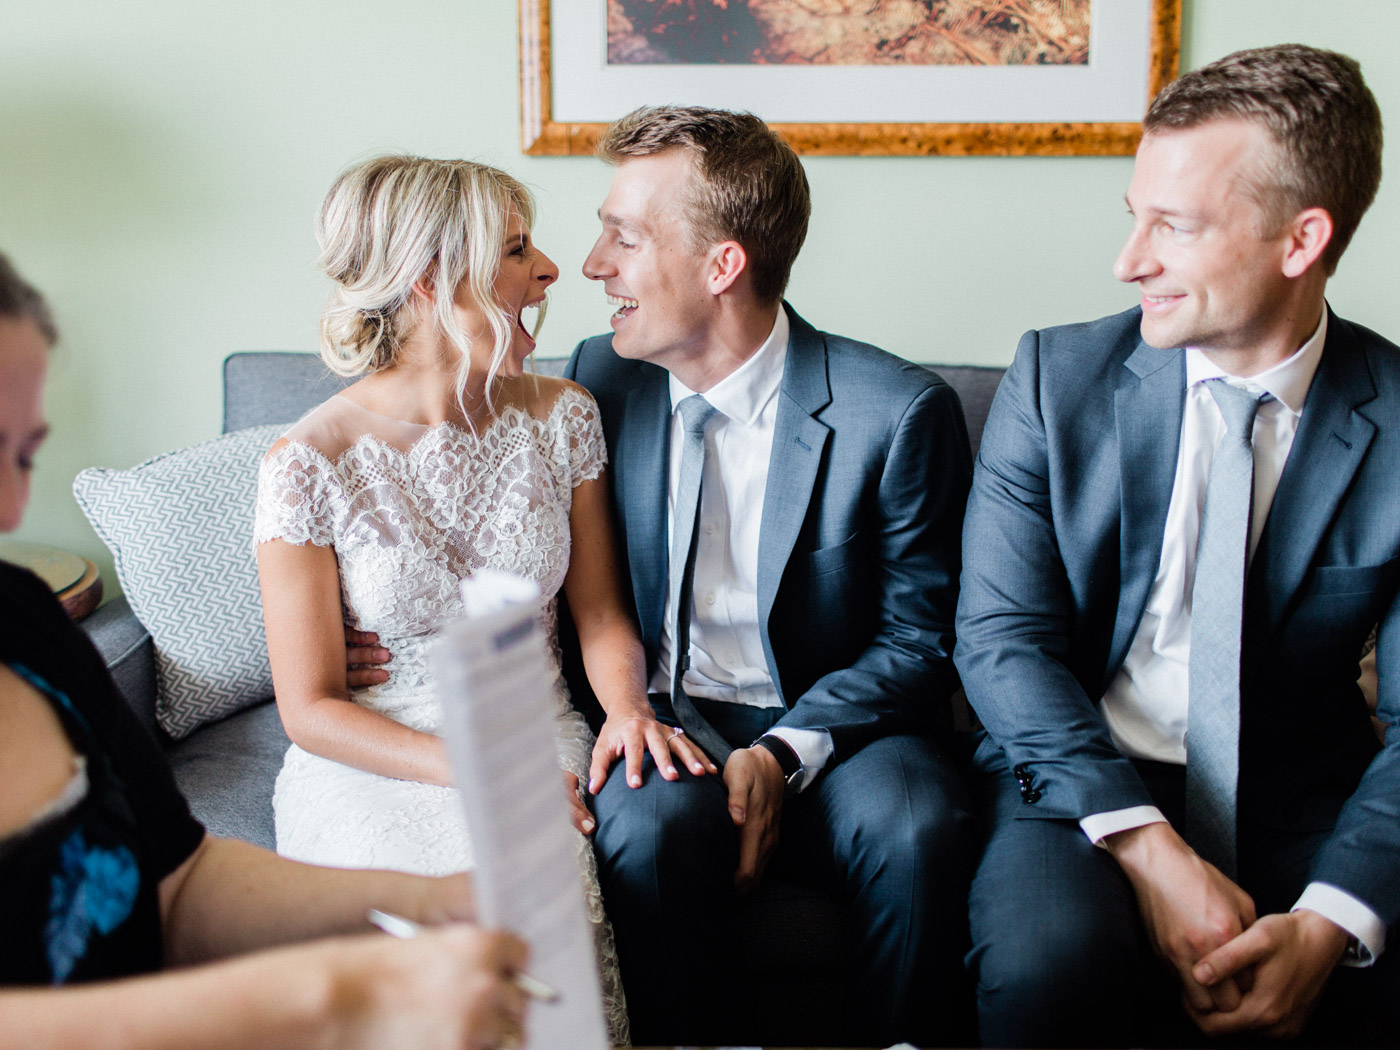 Toronto-Muskoka-wedding-photographer-summery-fun-documentary-the-marriott-rosseau58.jpg